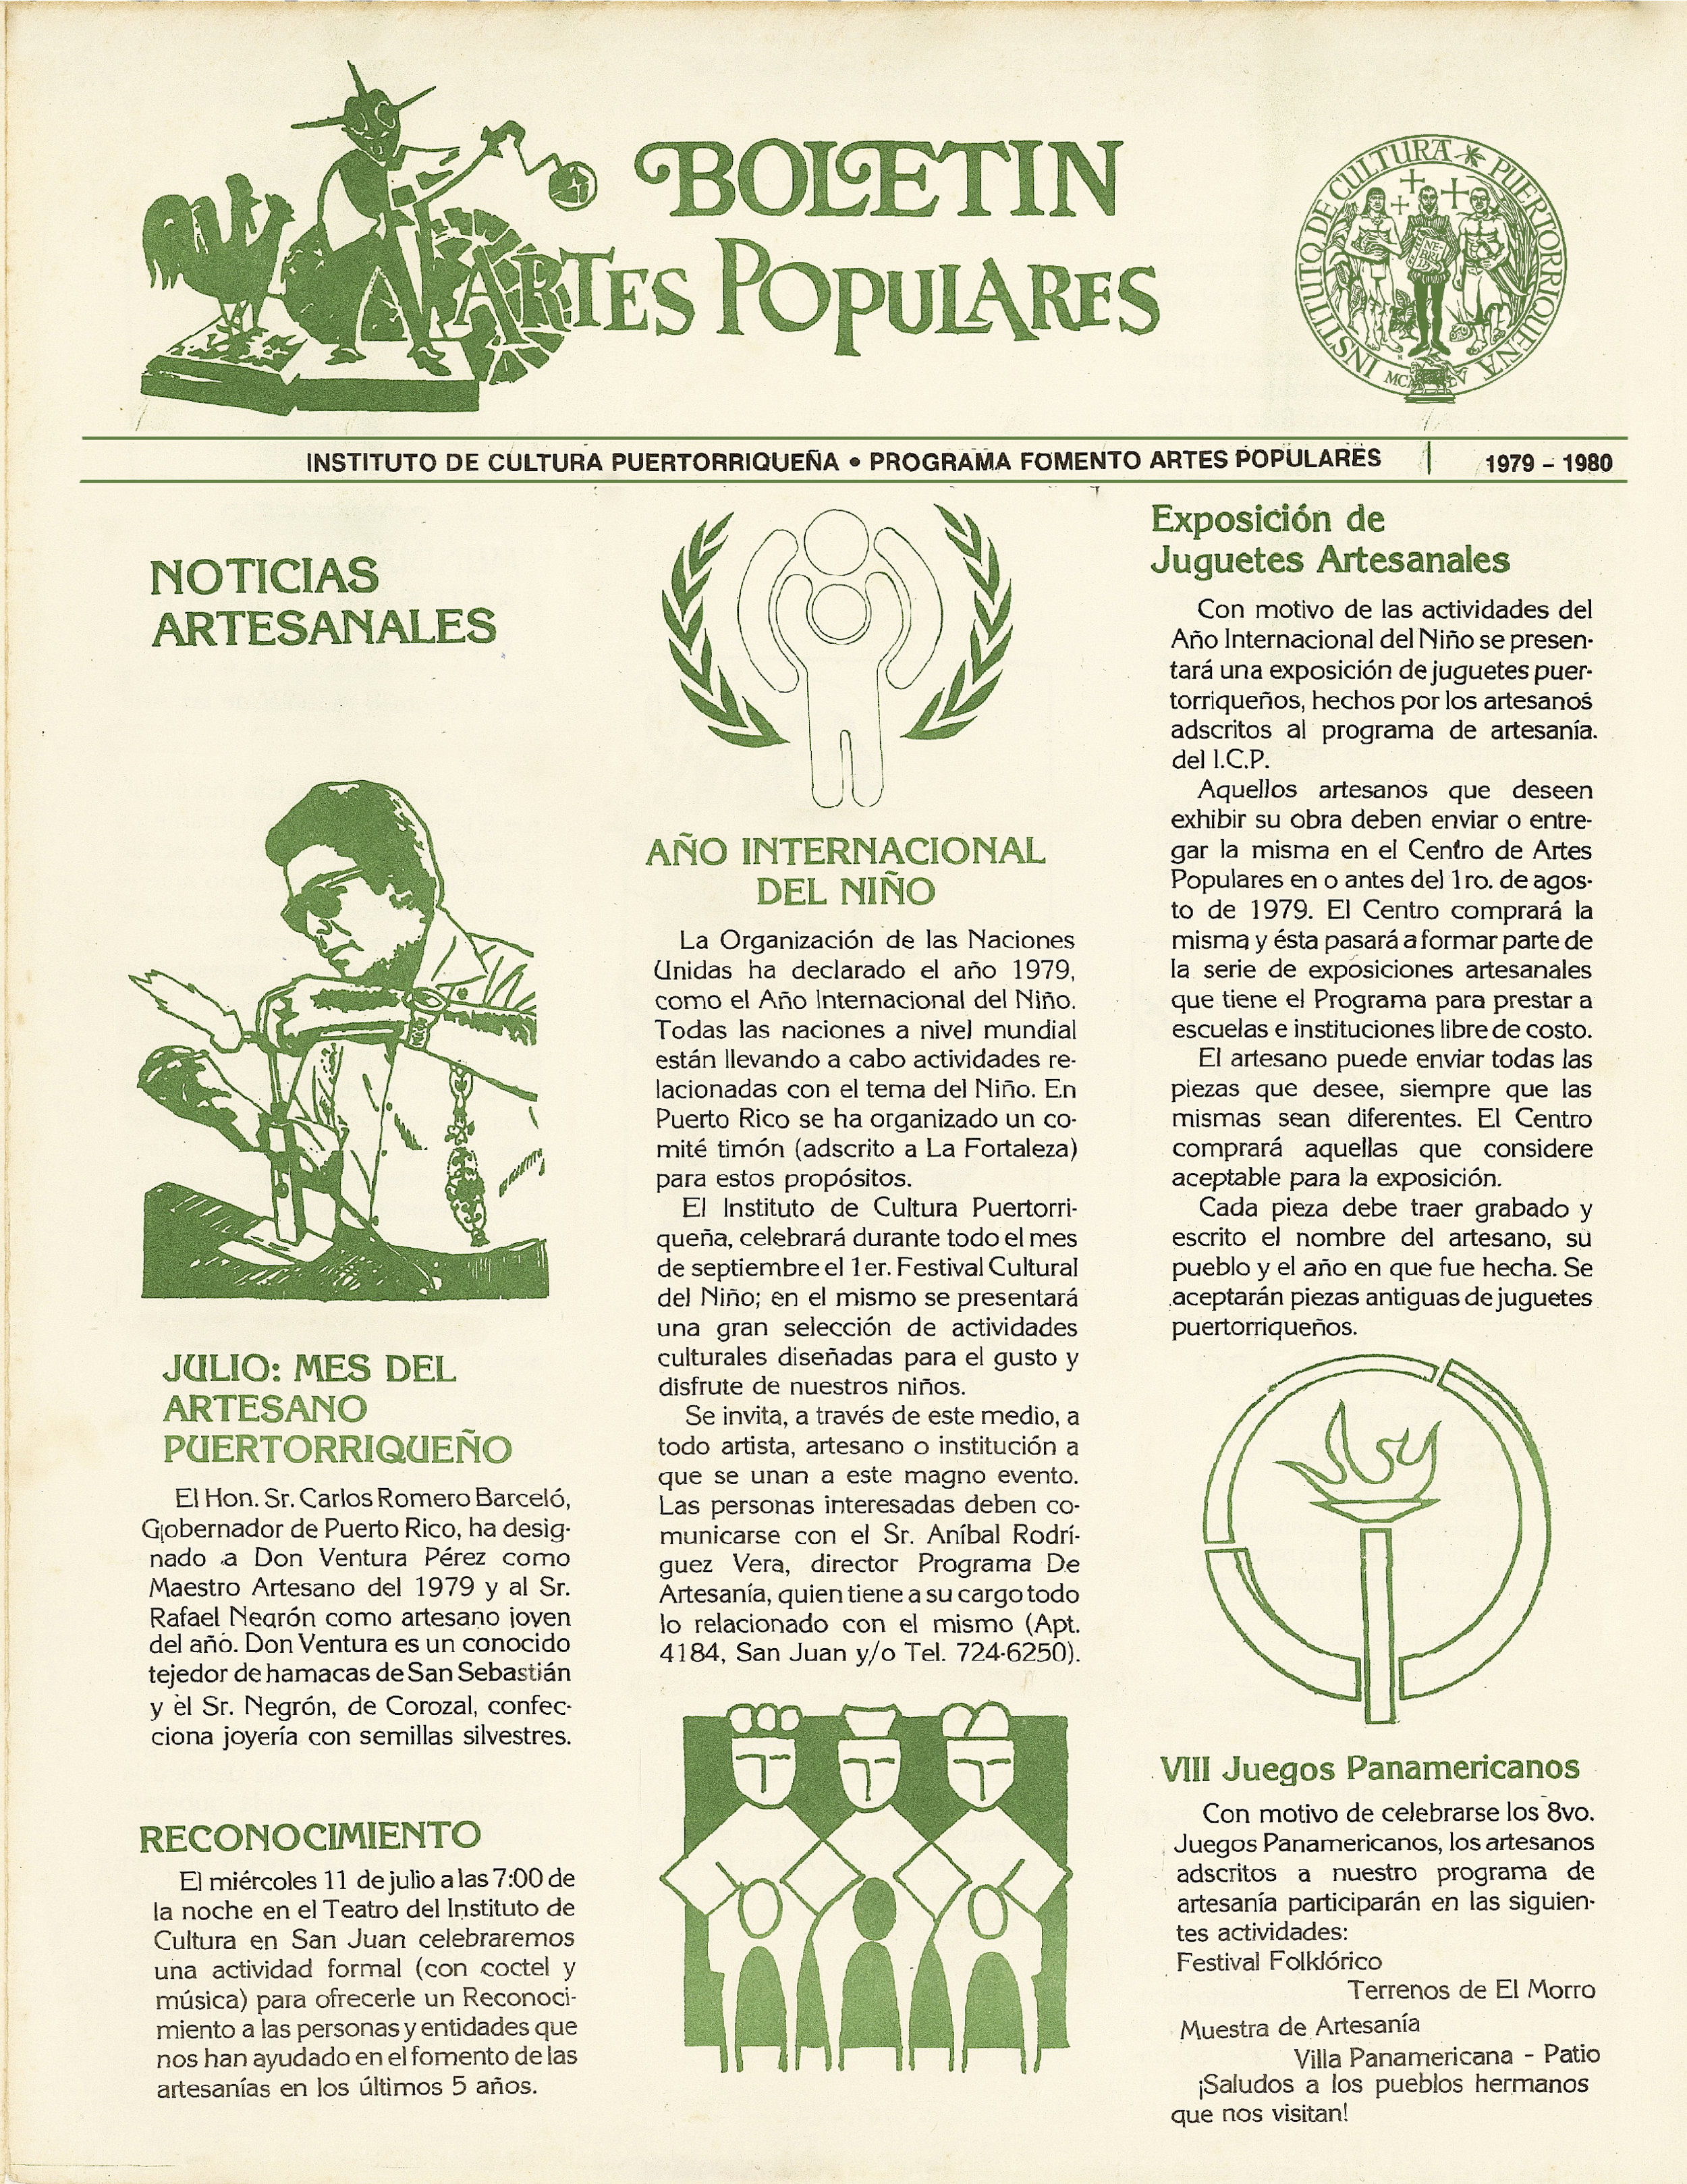 Boletín de Artes Populares, Suplemento Especial | 1979 - 1980